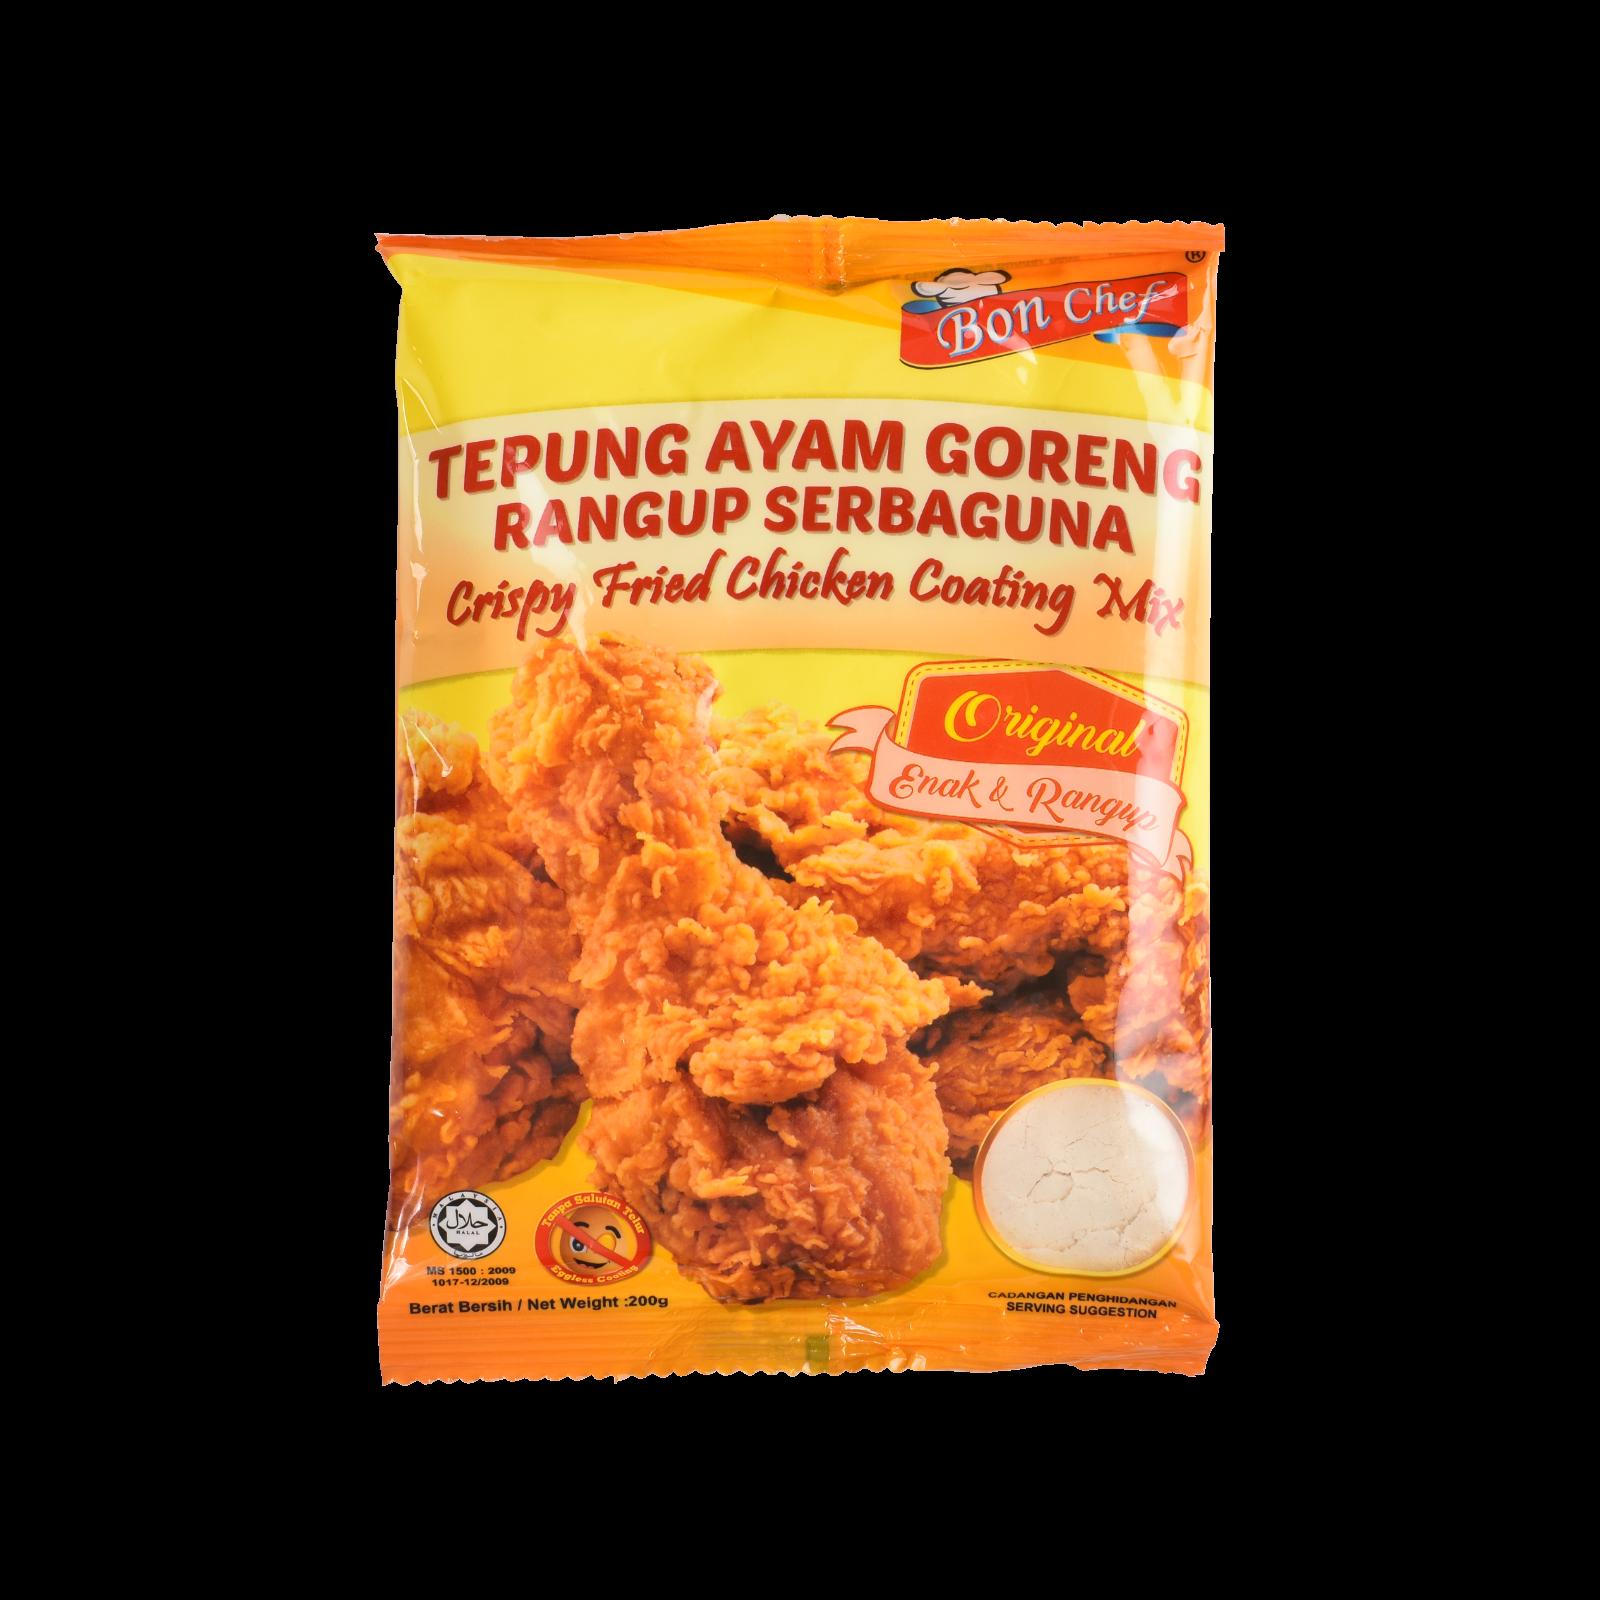 crispy fried chicken coating mix original.png